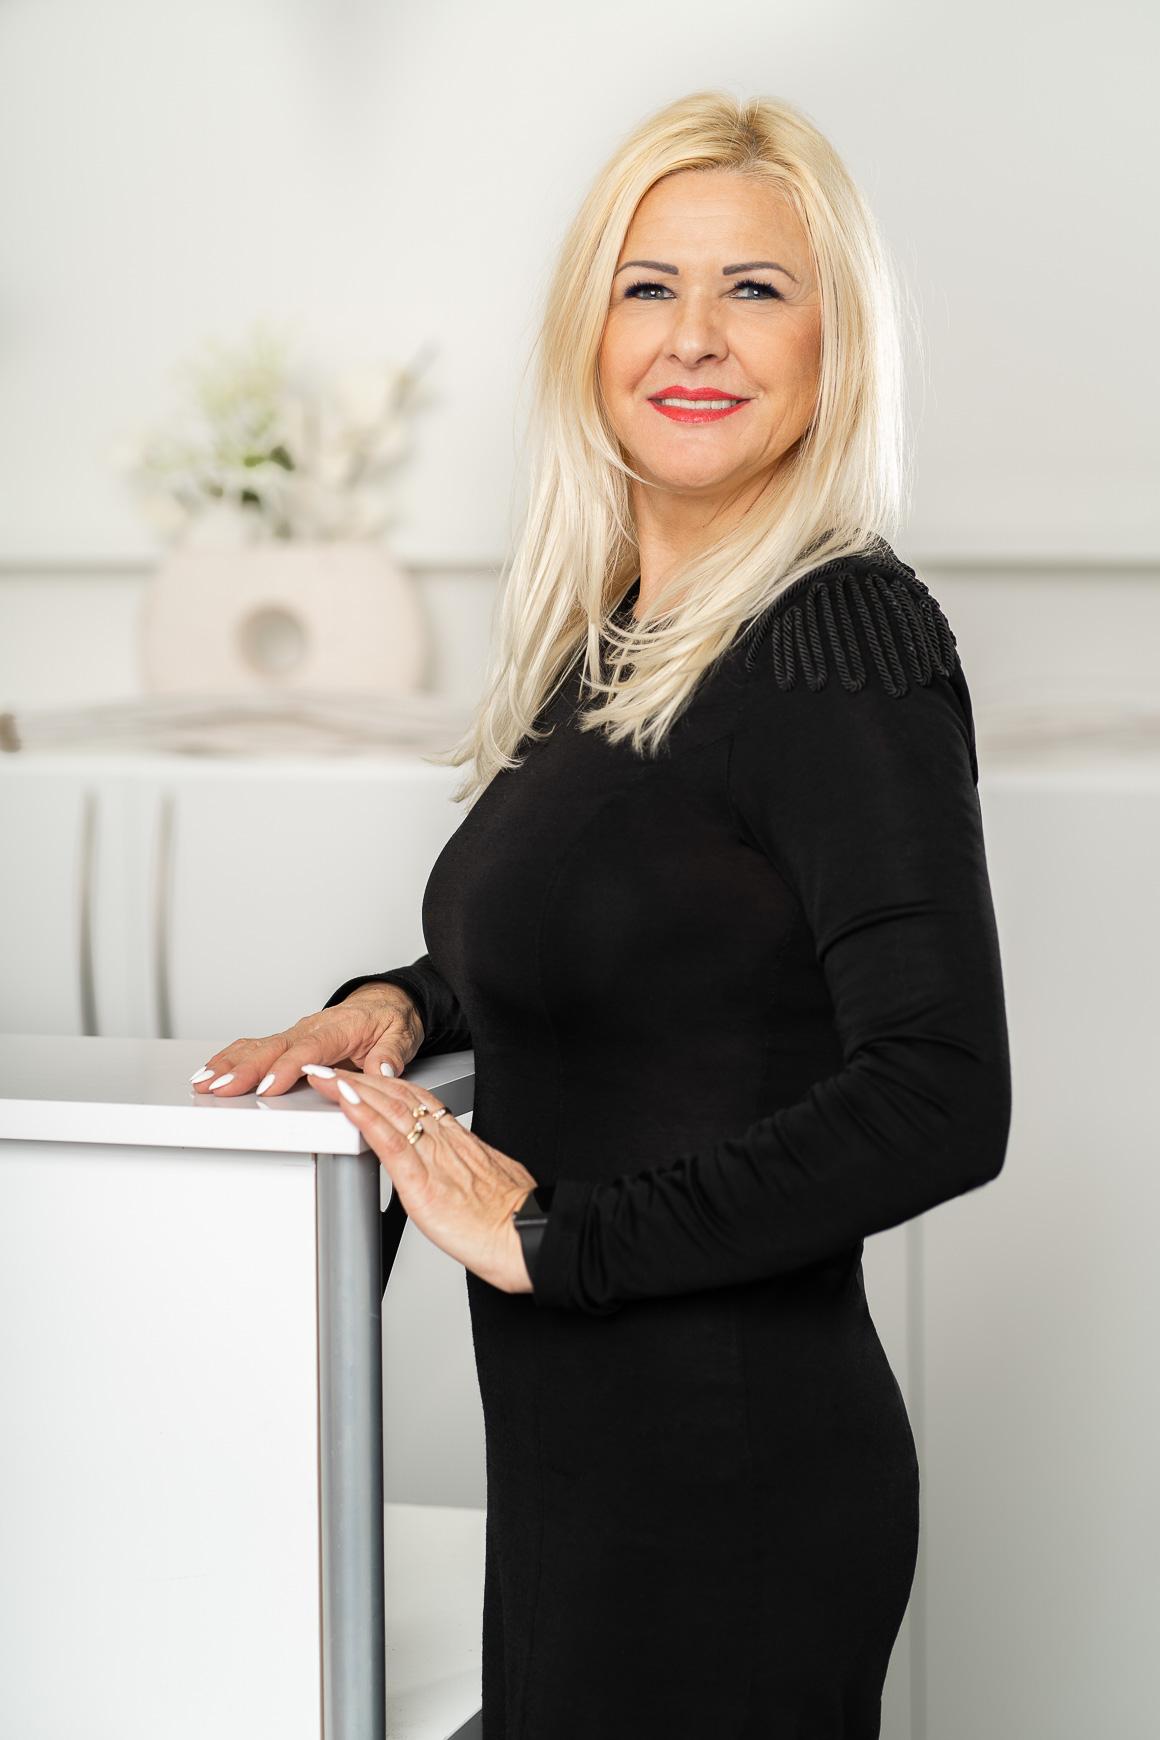 Business Kosmetikstudie Angelie Bouton Vito Photography Dormagen Web 6